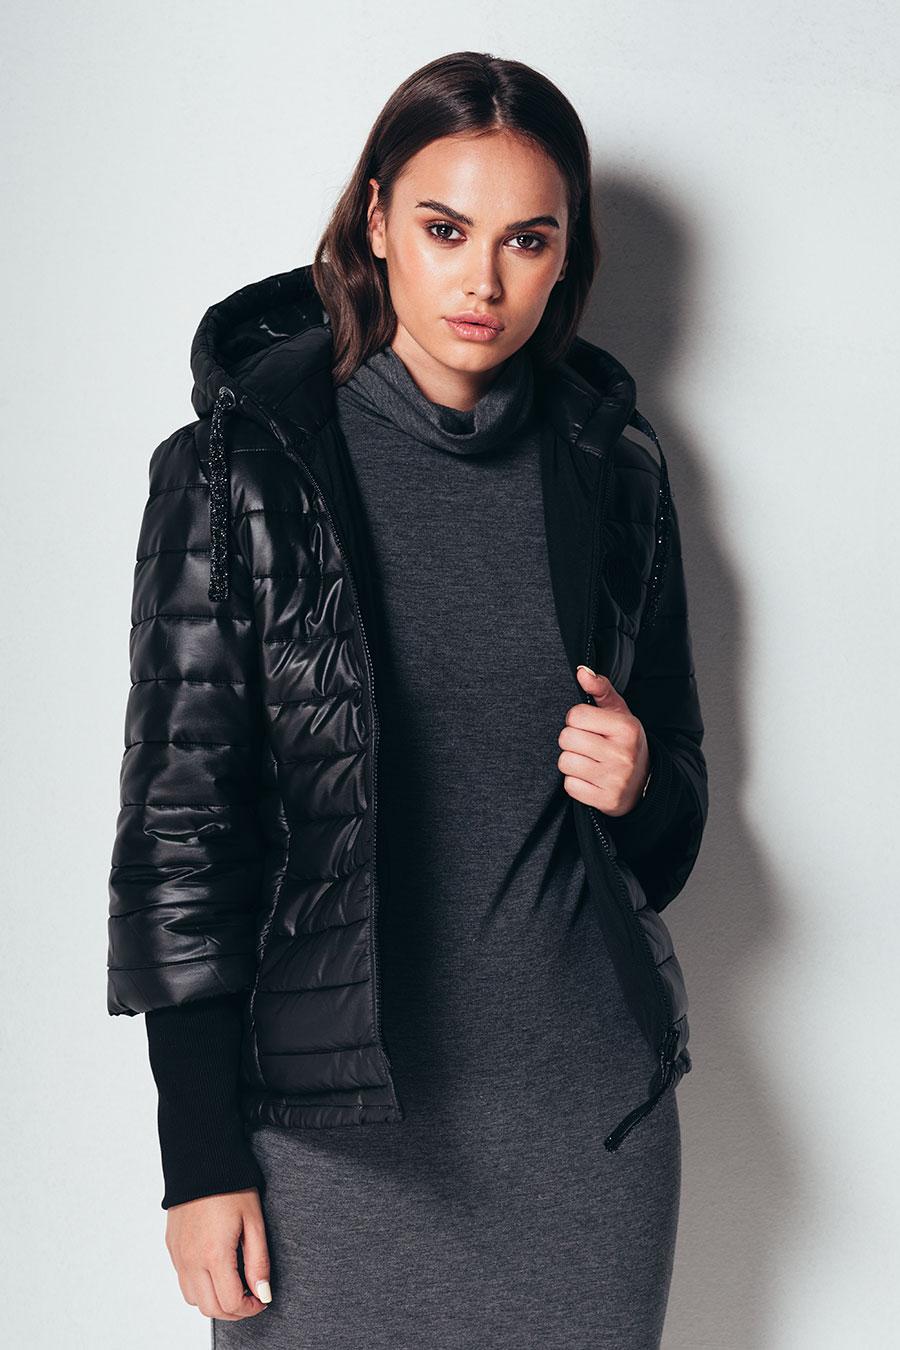 jagger internet prodavnica kolekcija jesen zima 2021 zenska jakna jg 6232 01 3